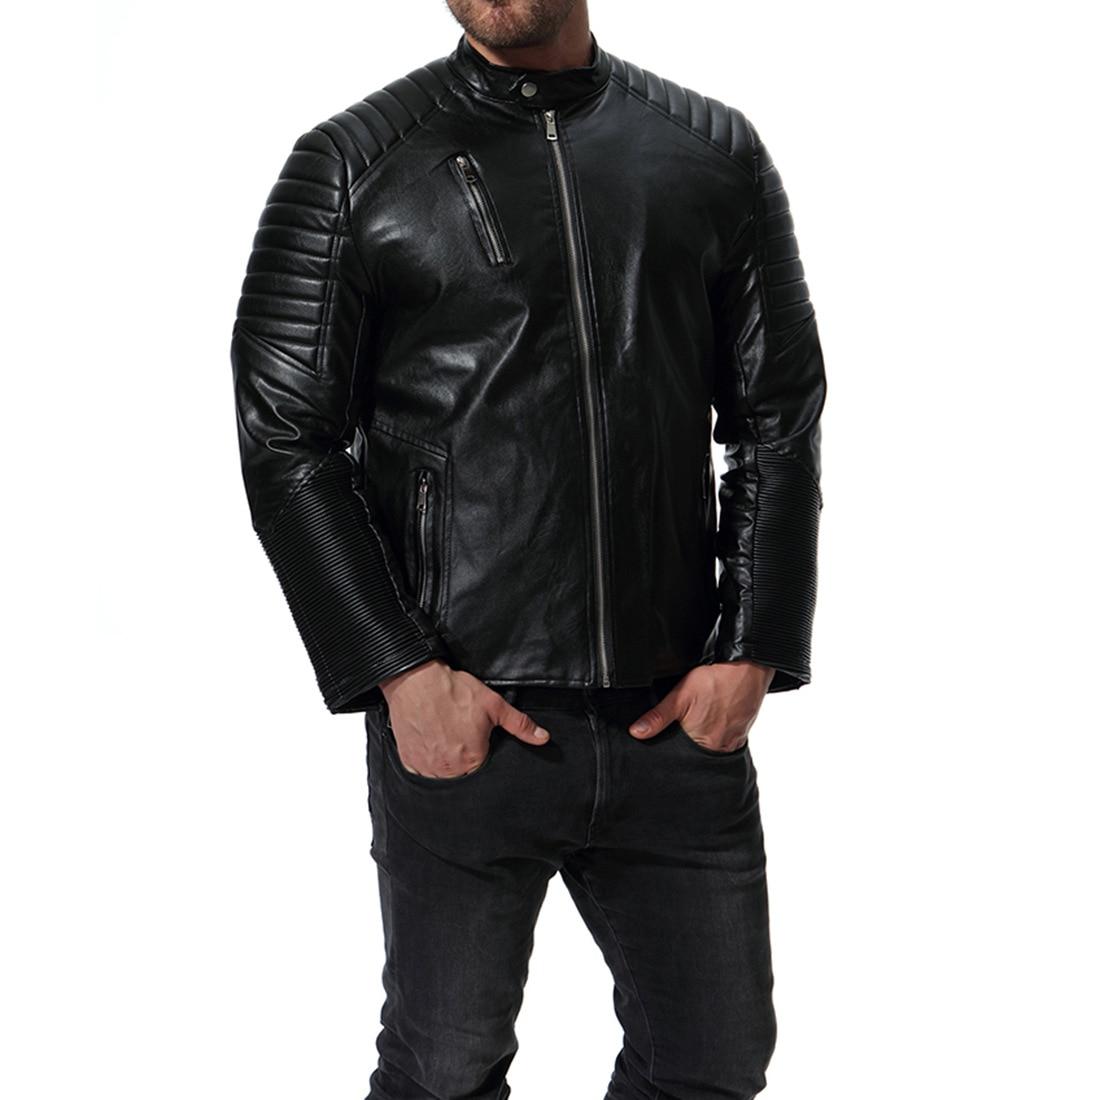 Motocicleta Hombres Jaqueta xxl Hombre S Masculinas Cremallera Cuero 2018 Chaqueta Marca Multi Negro 7Rq8av